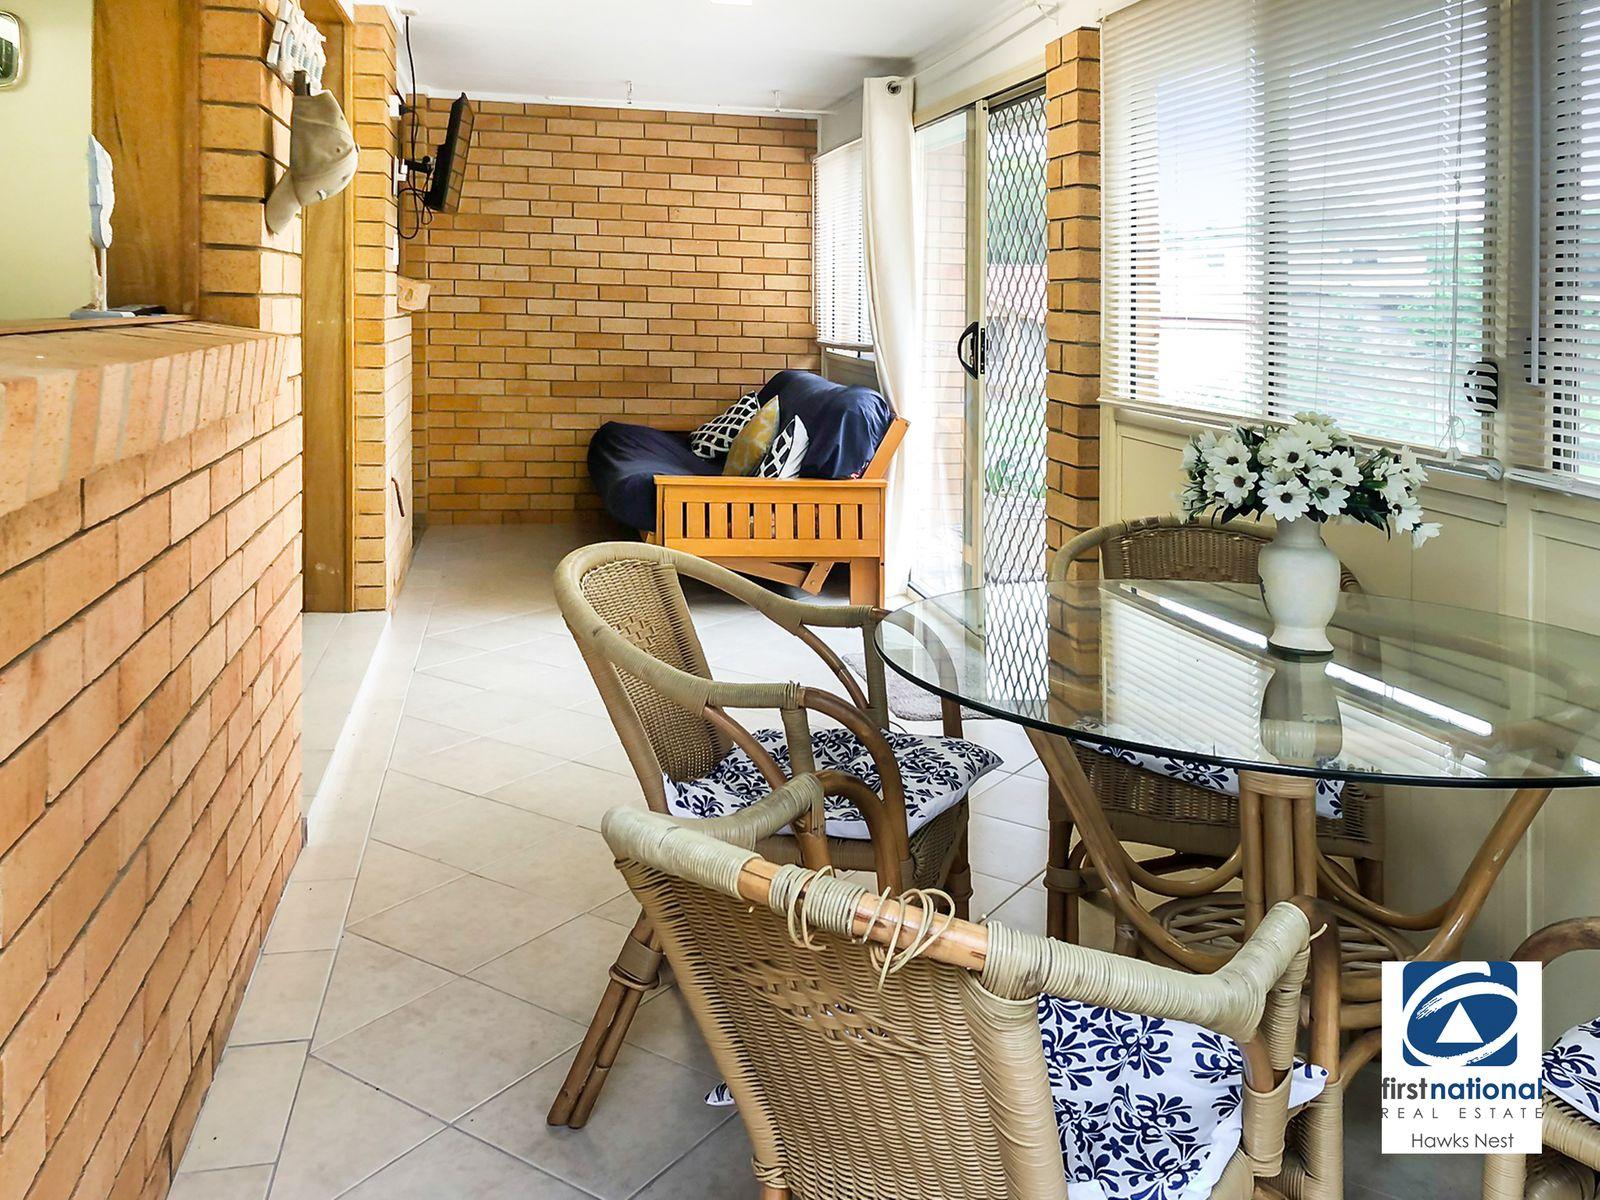 13 Kingfisher Avenue, Hawks Nest, NSW 2324